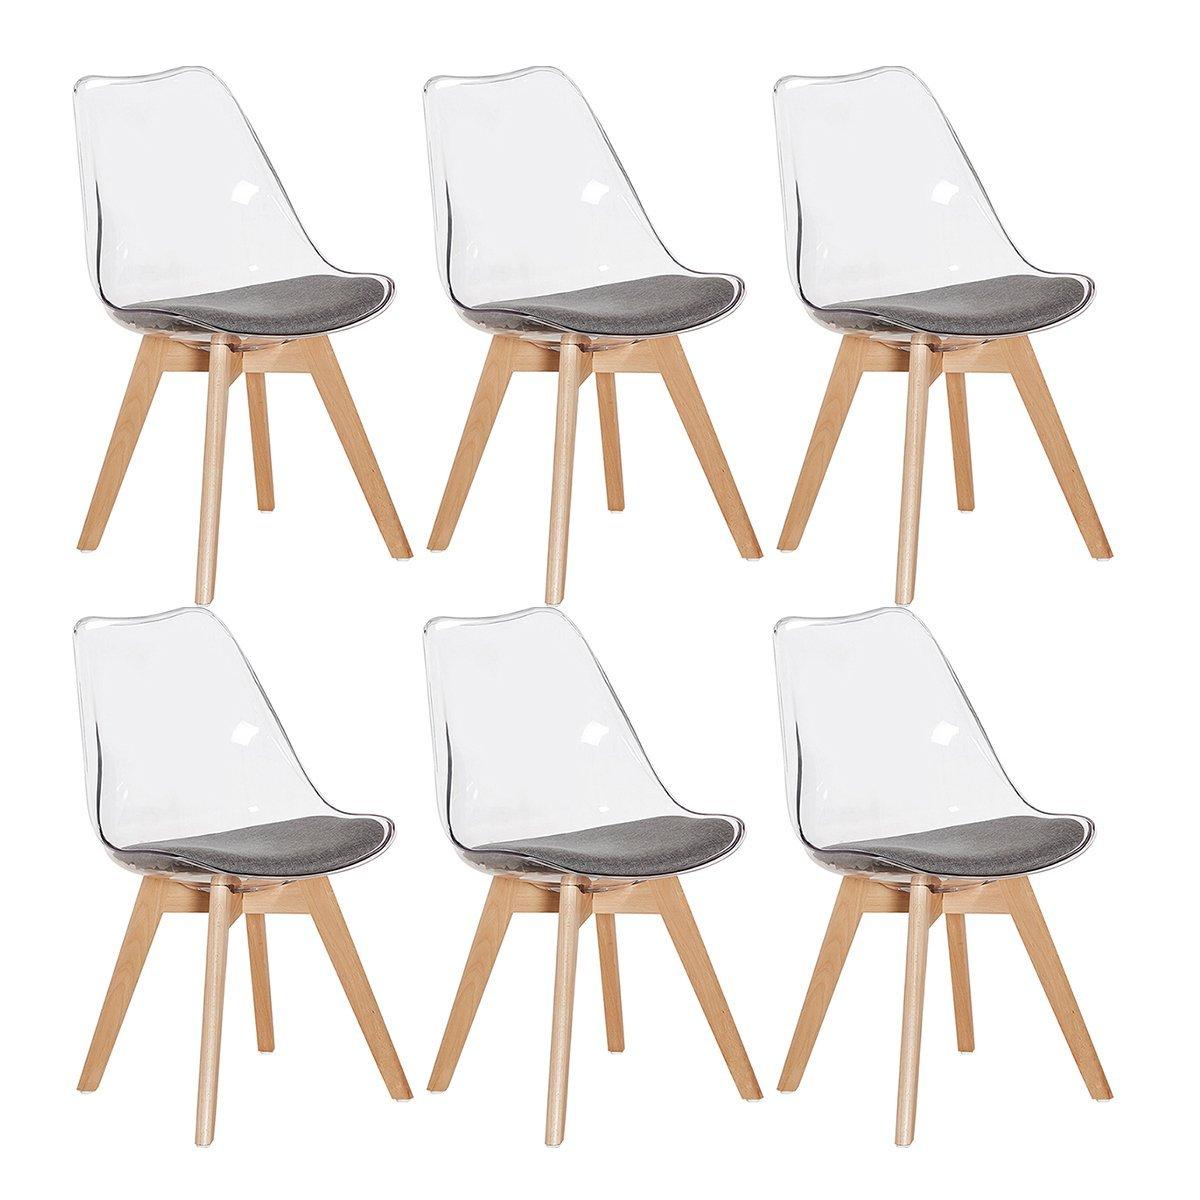 Set di 2 4 6 sedie trasparente in policarbonato sedie for Sedie policarbonato